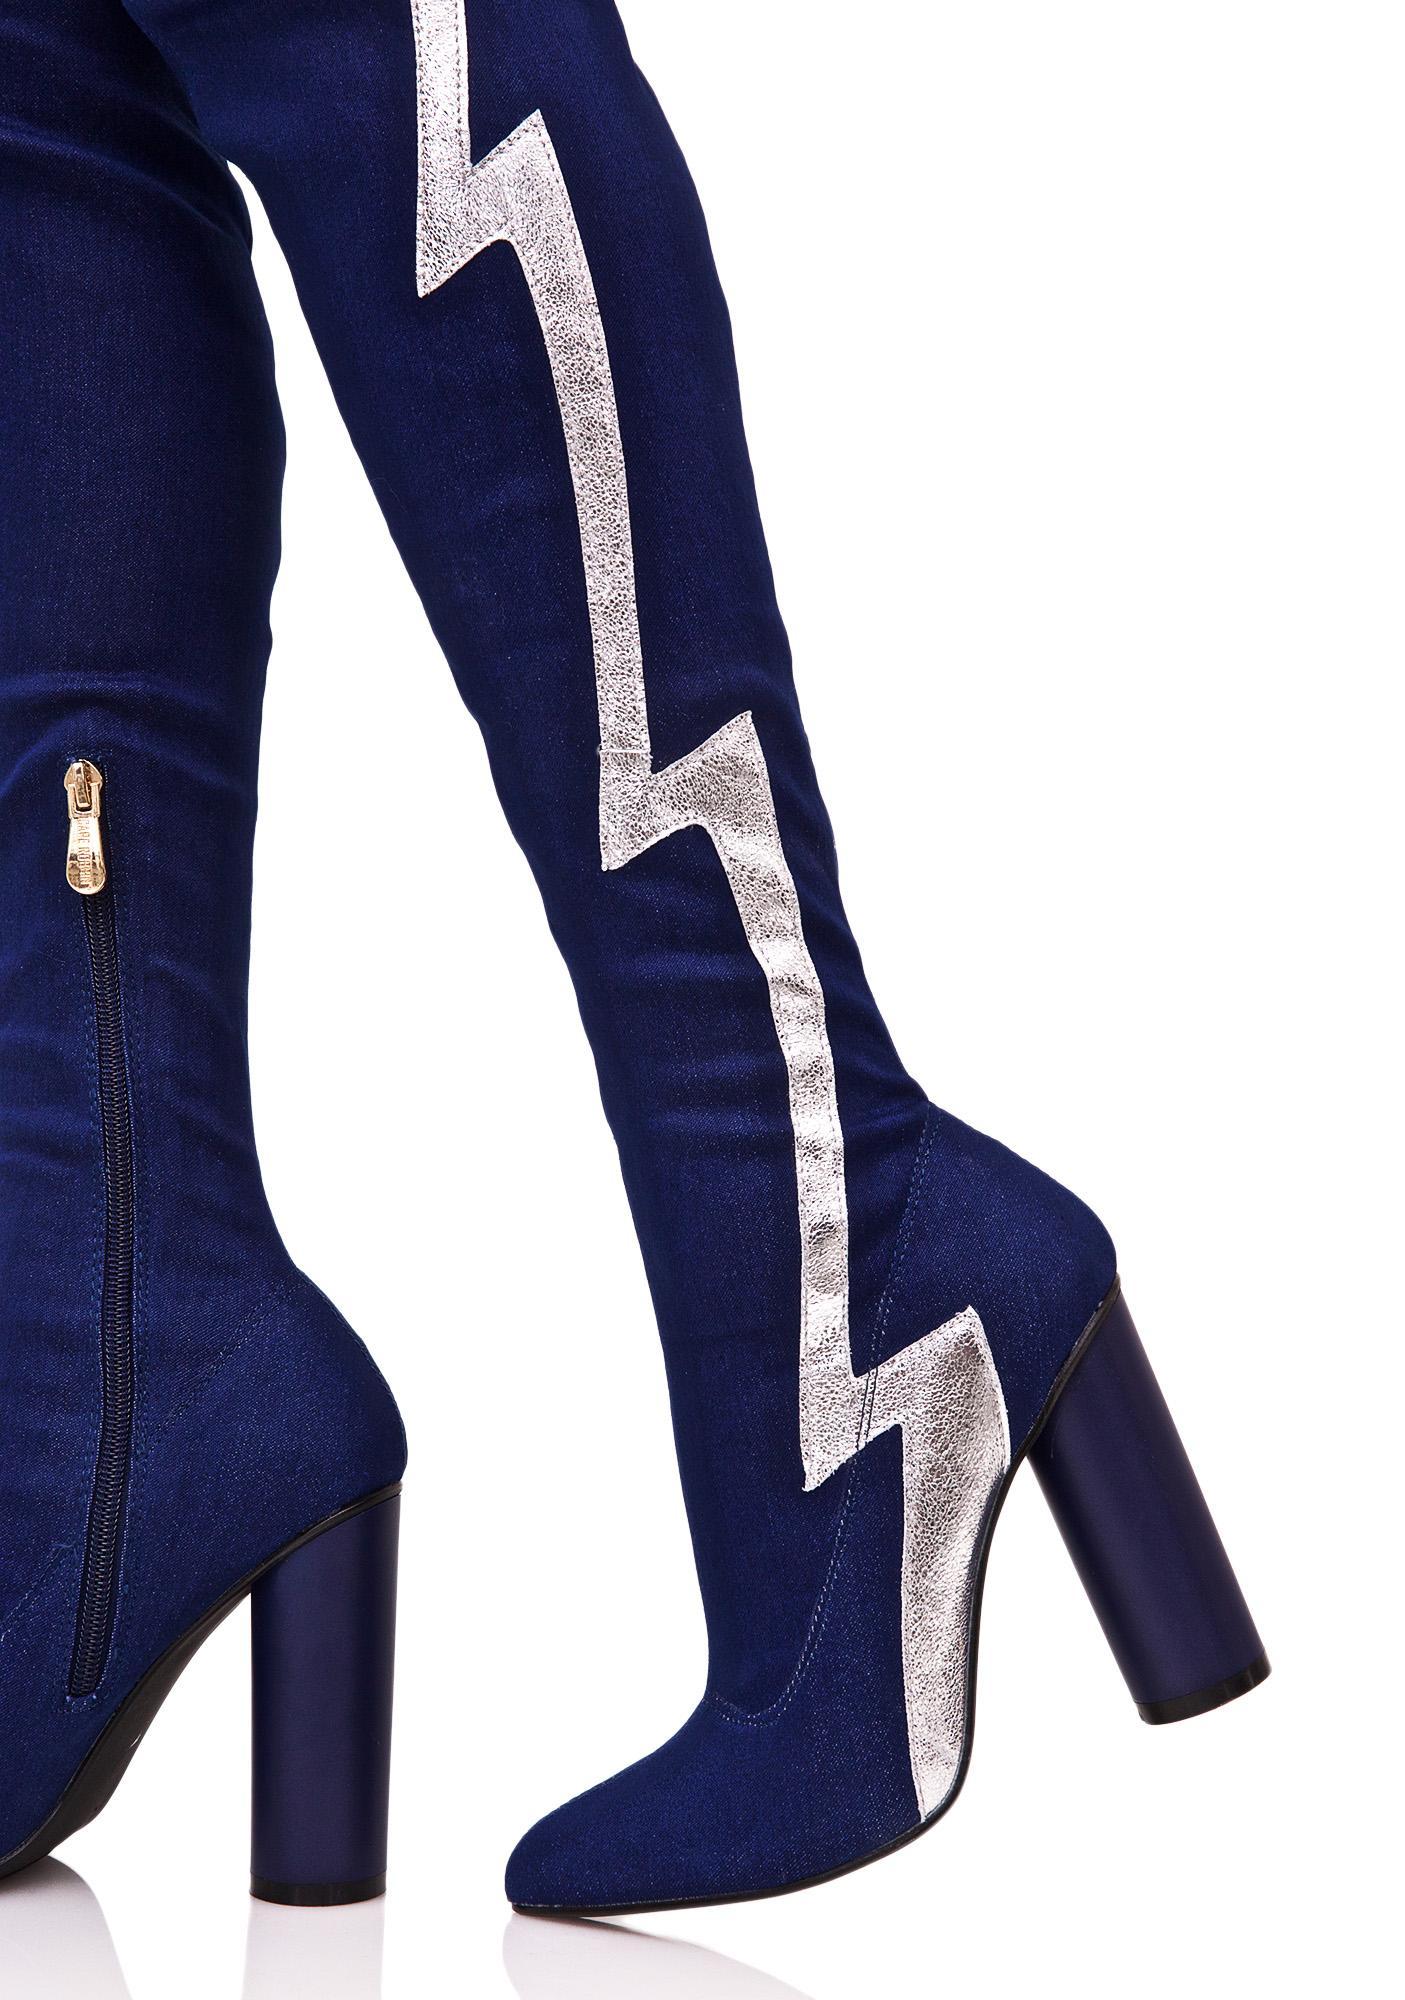 Thunderstrike Thigh-High Boots